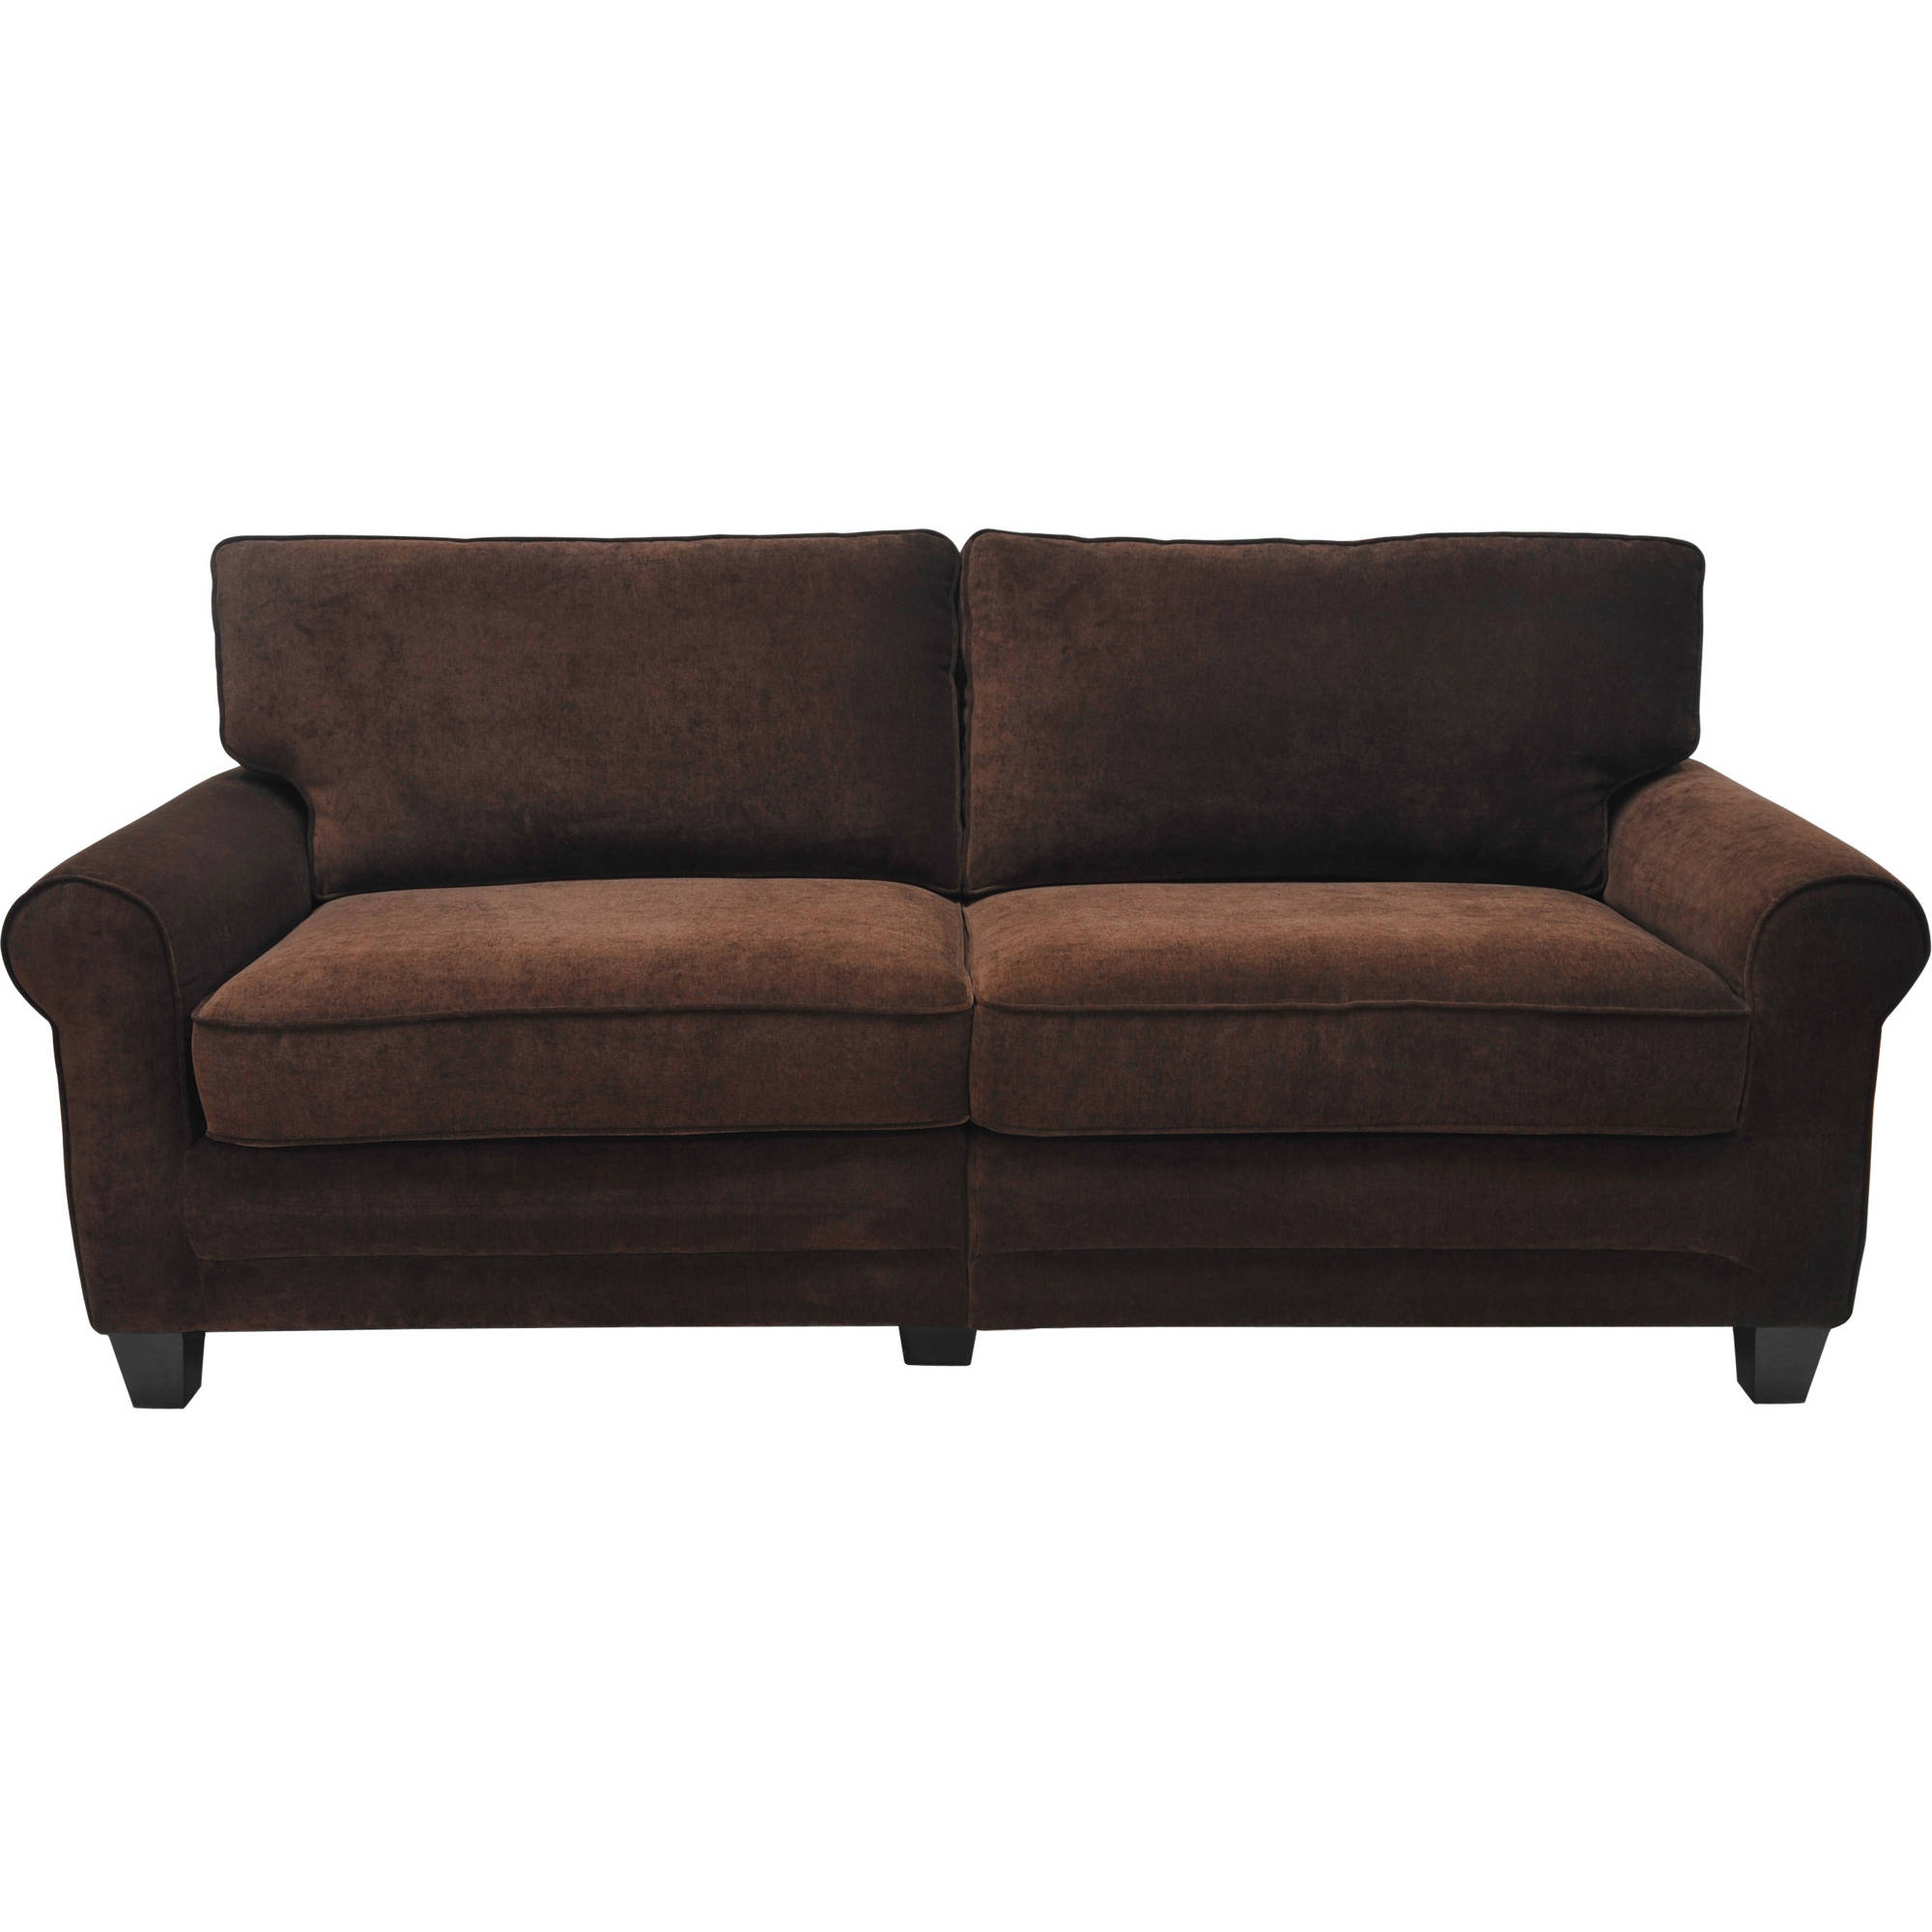 "Mansfield Graphite Velvet Sofa Chairs Inside Preferred Serta Rta Copenhagen Collection 73"" Sofa, Multiple Colors – Walmart (View 12 of 20)"